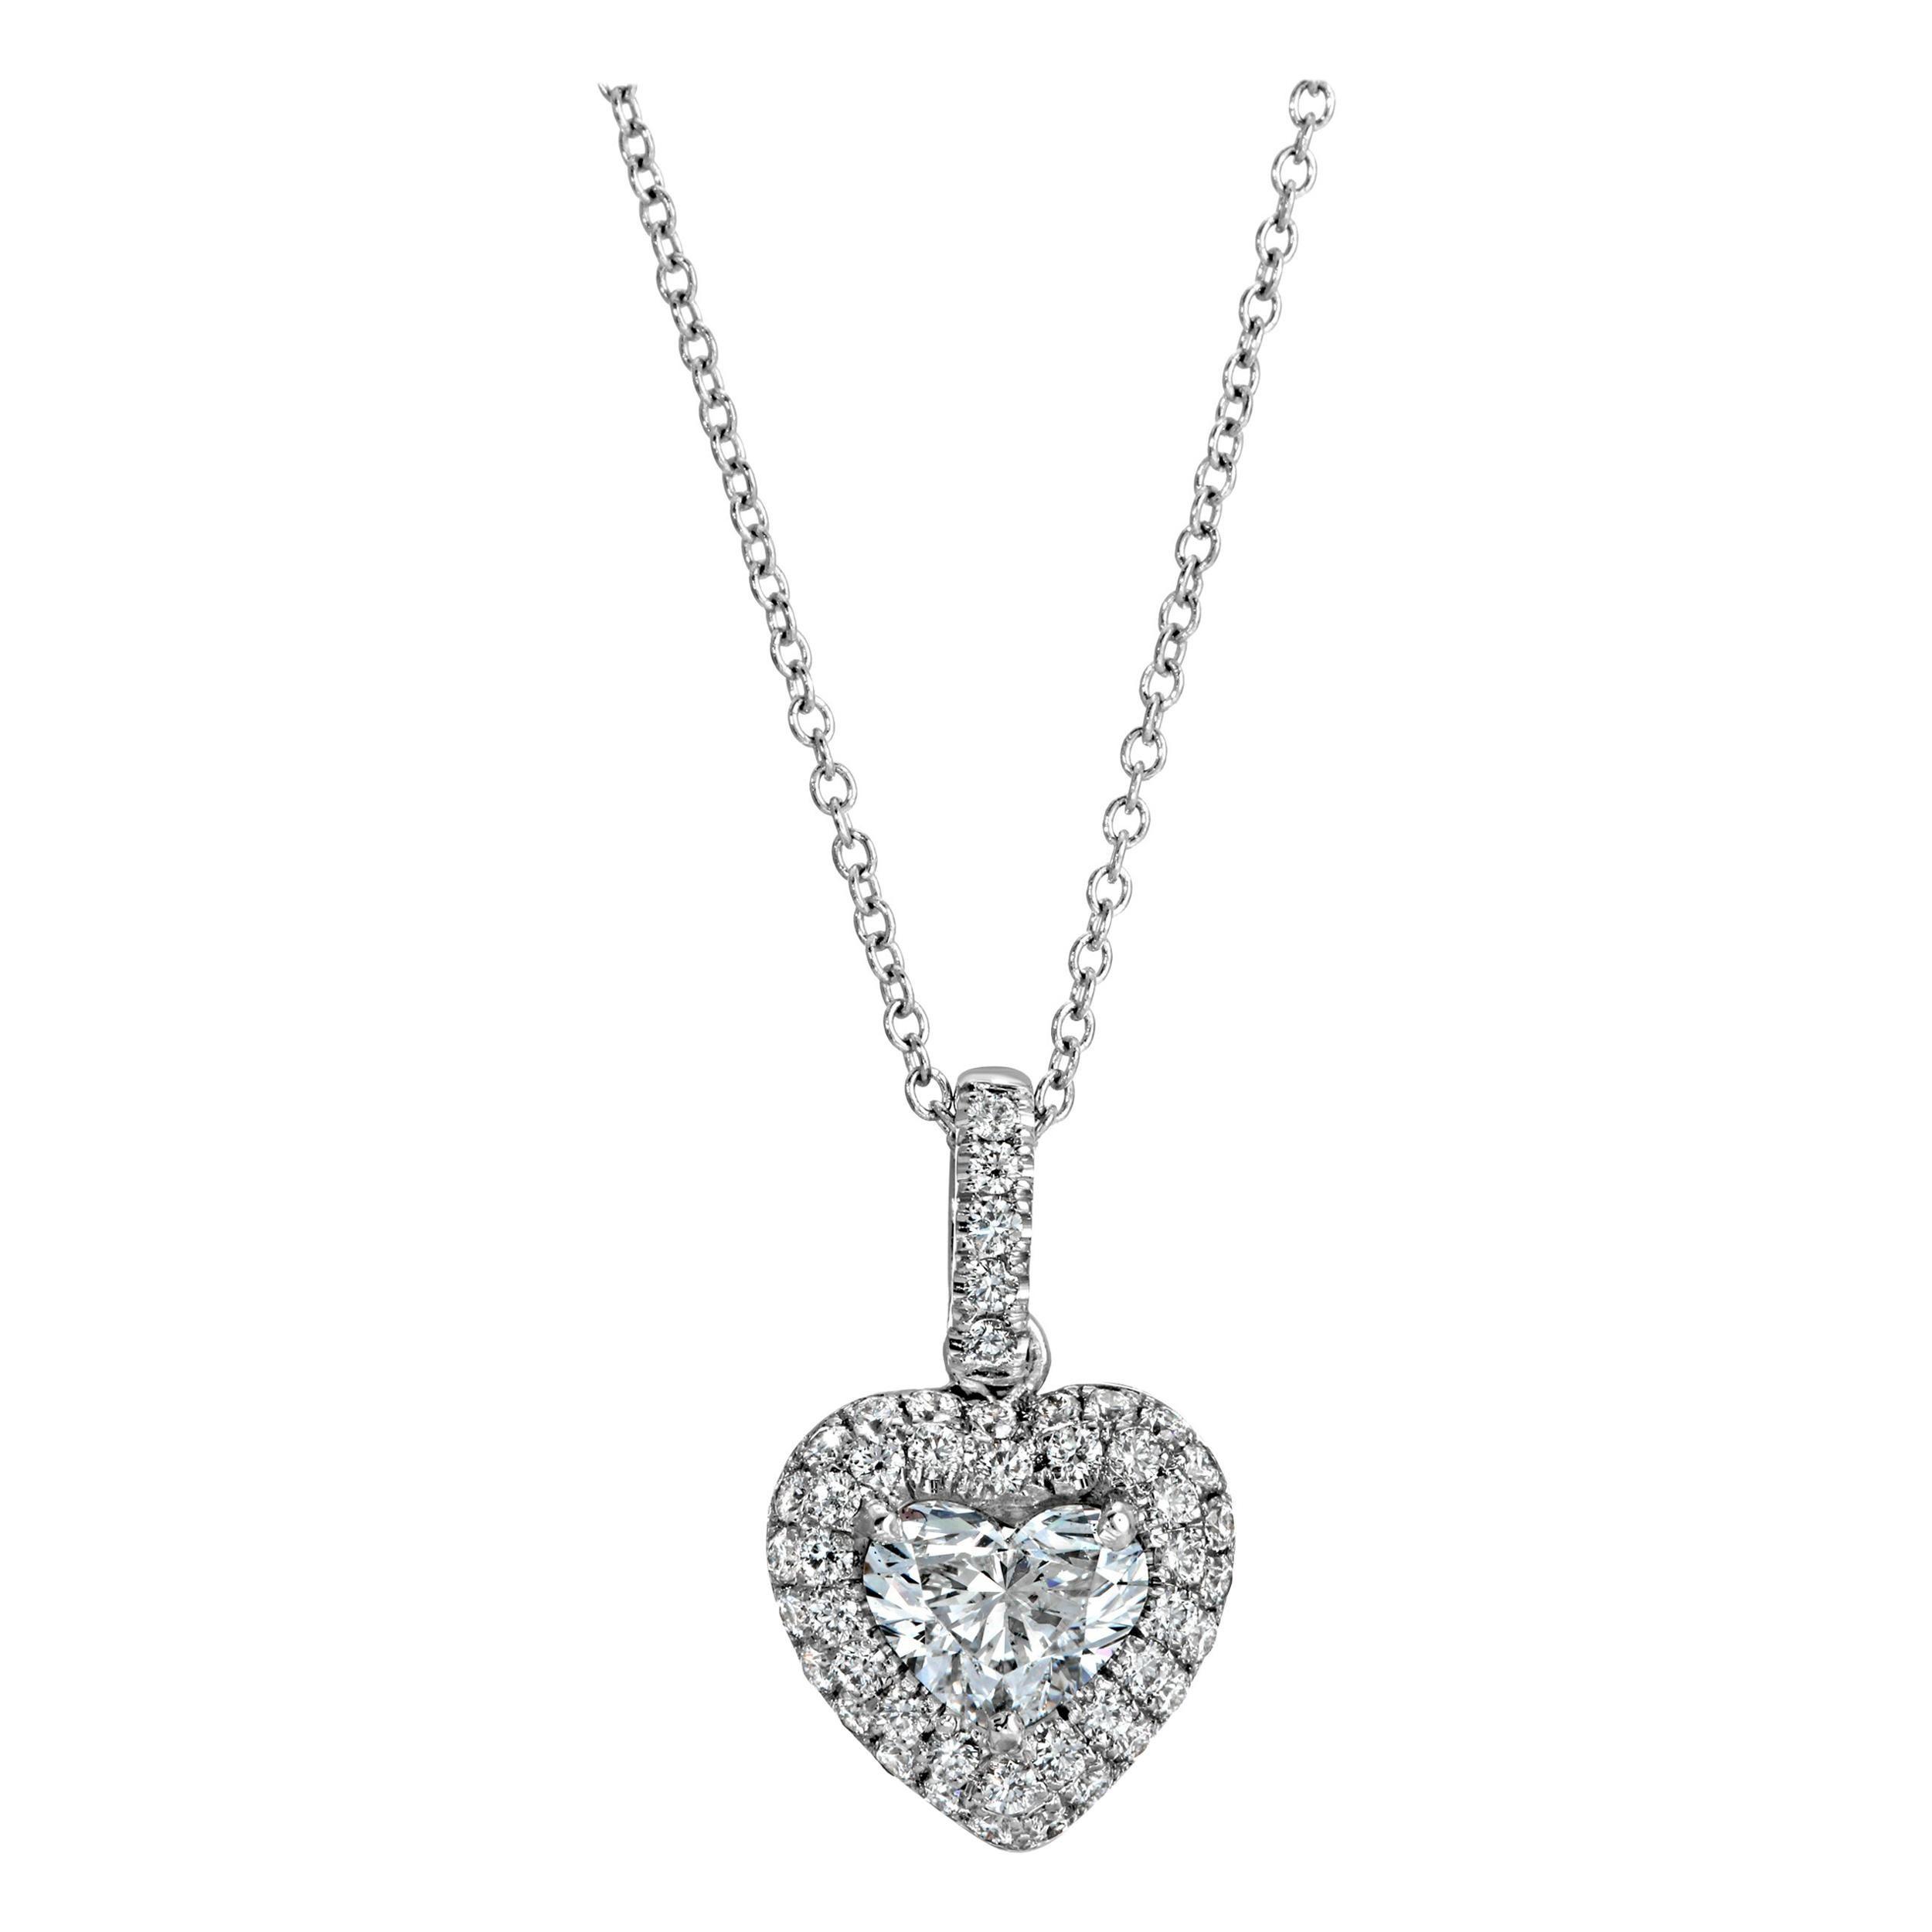 Heart Shape Diamond Pendant 1.35 carat 18KWG